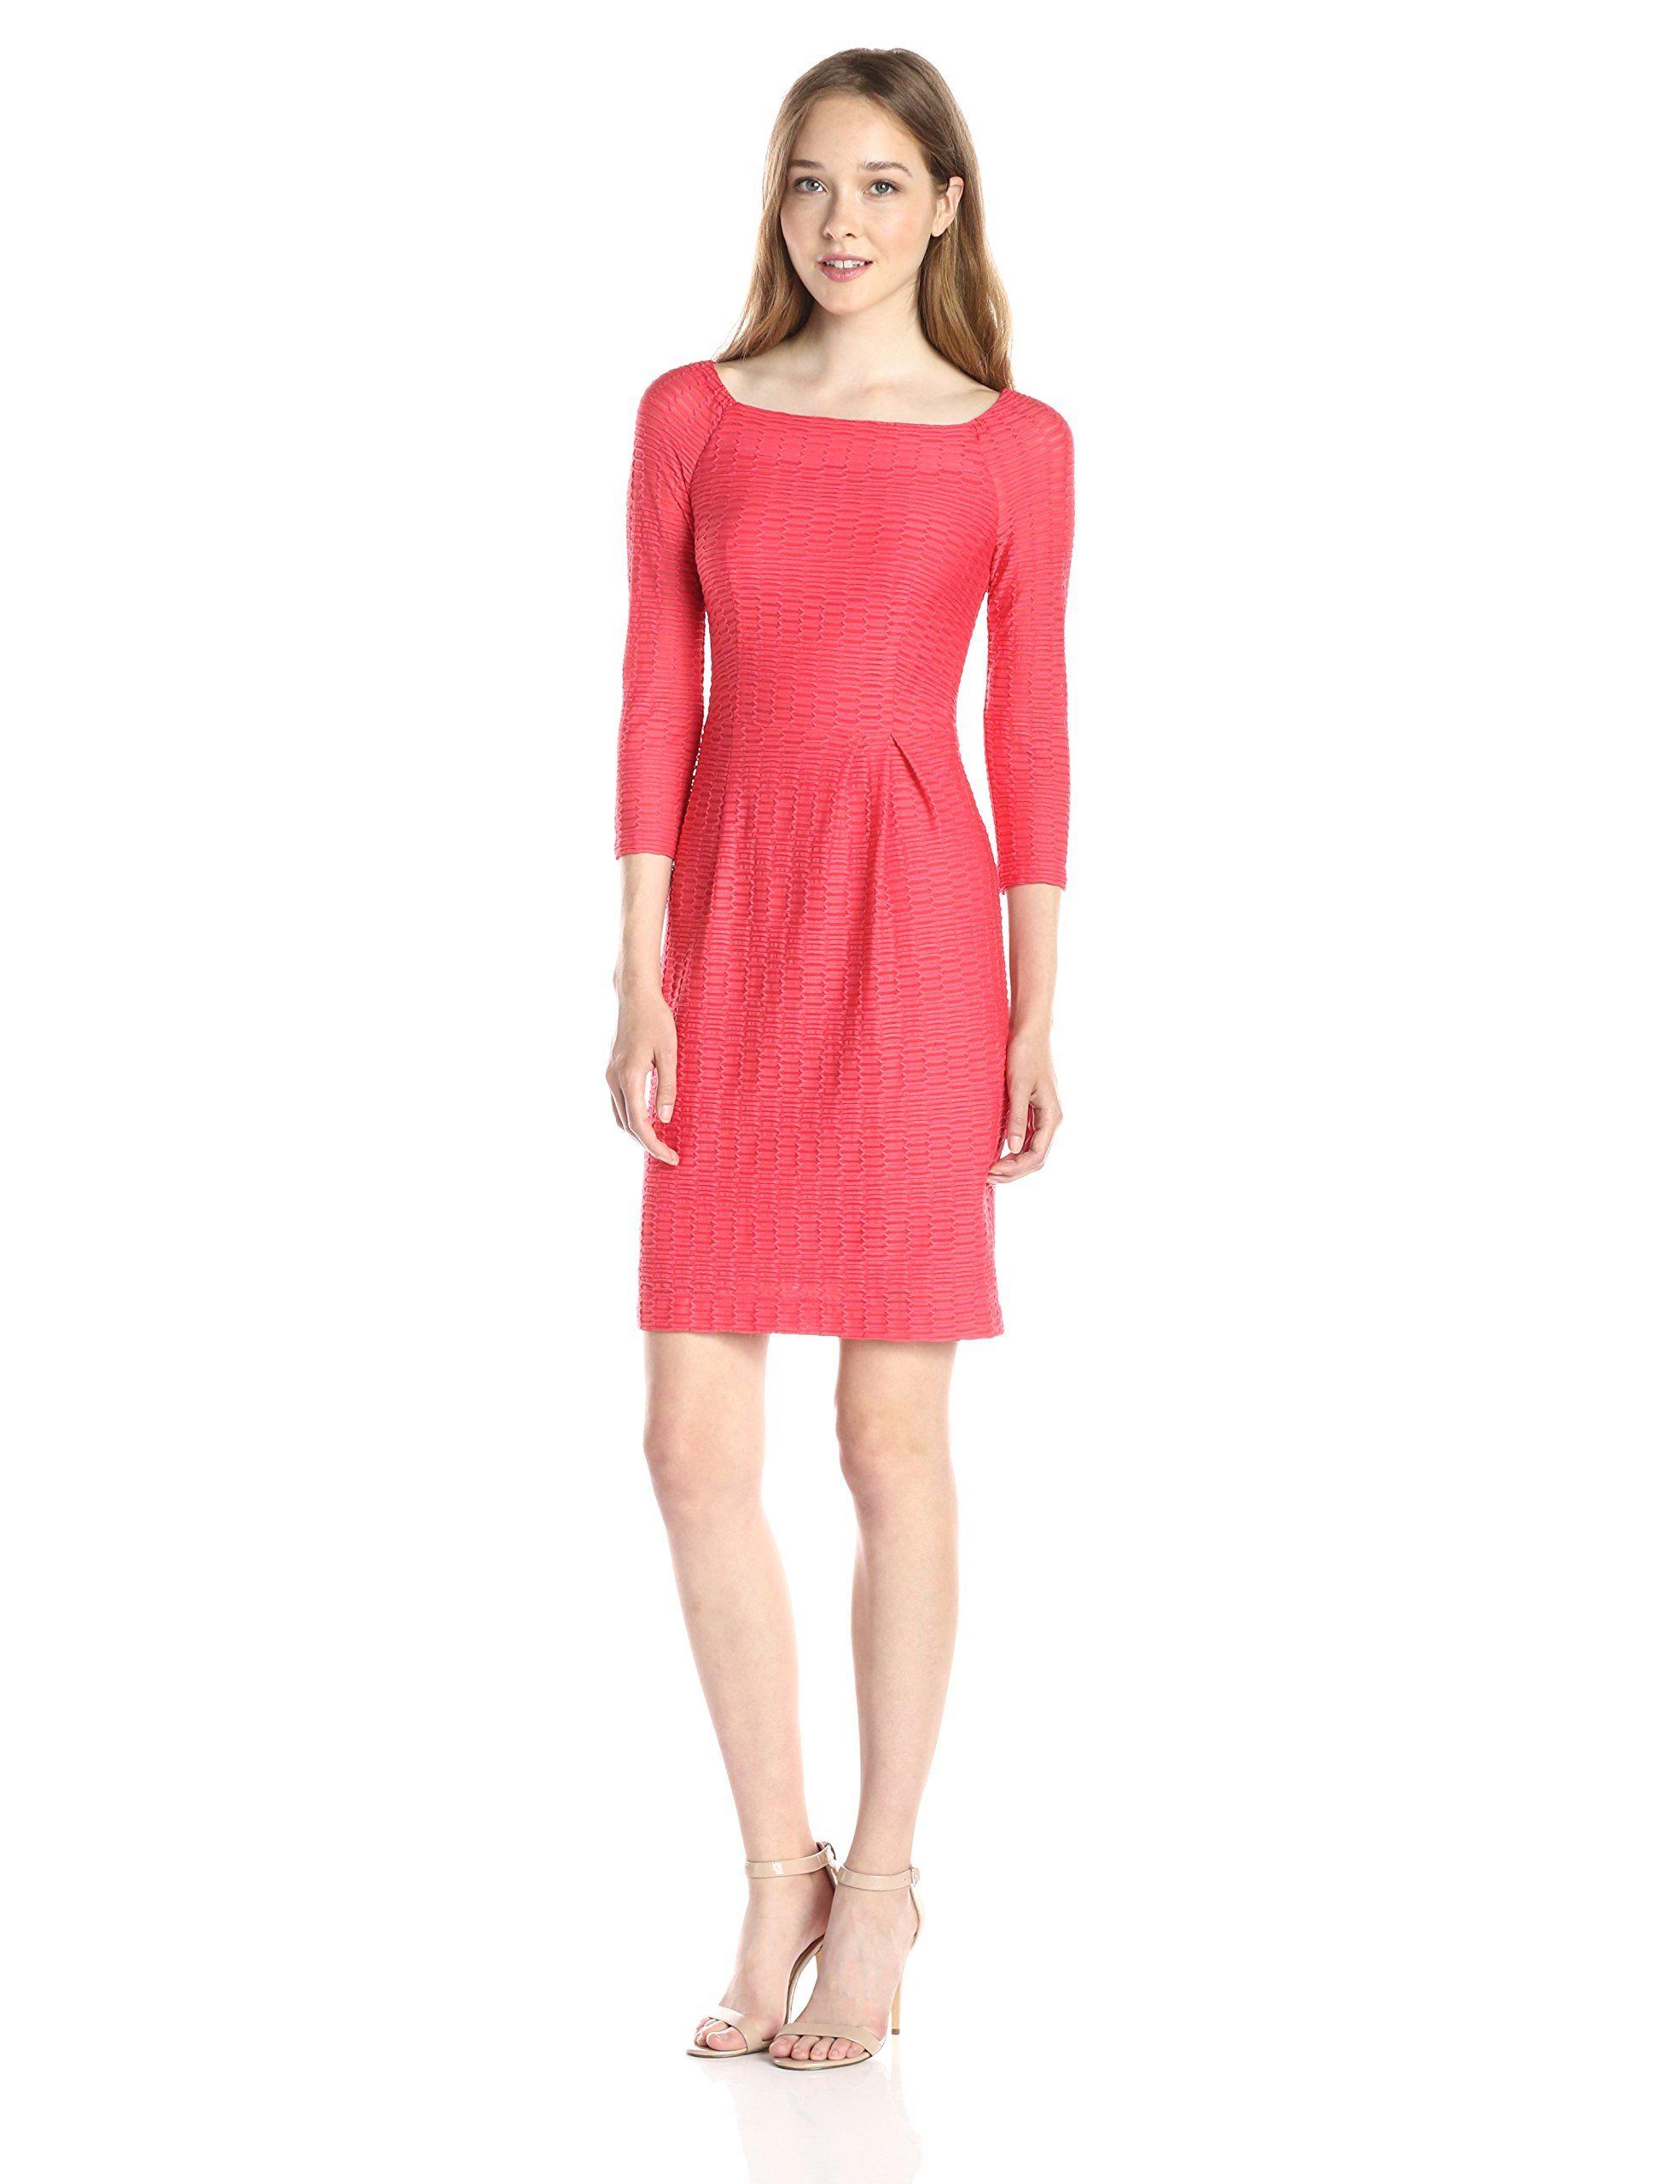 Nanette lepore womenus sleek and chic sleeve boat neck dress